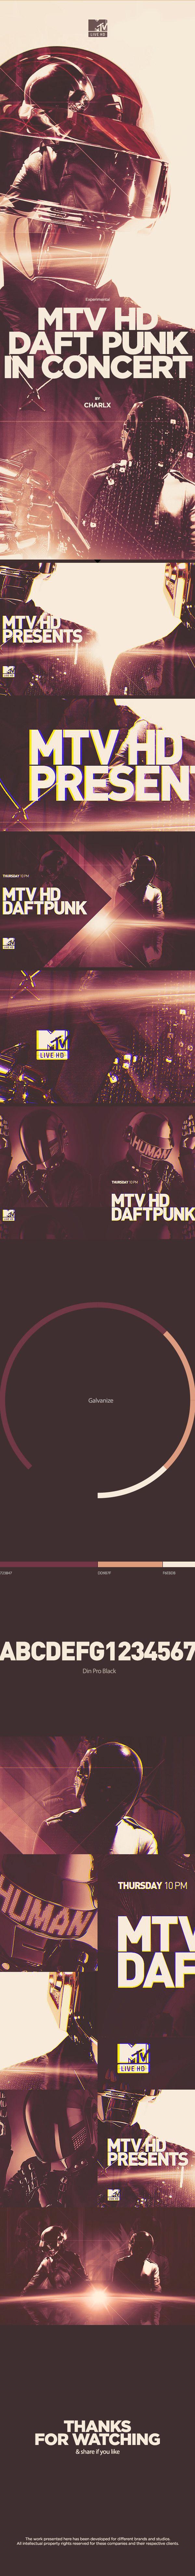 MTV HD | DAFT PUNK on Behance